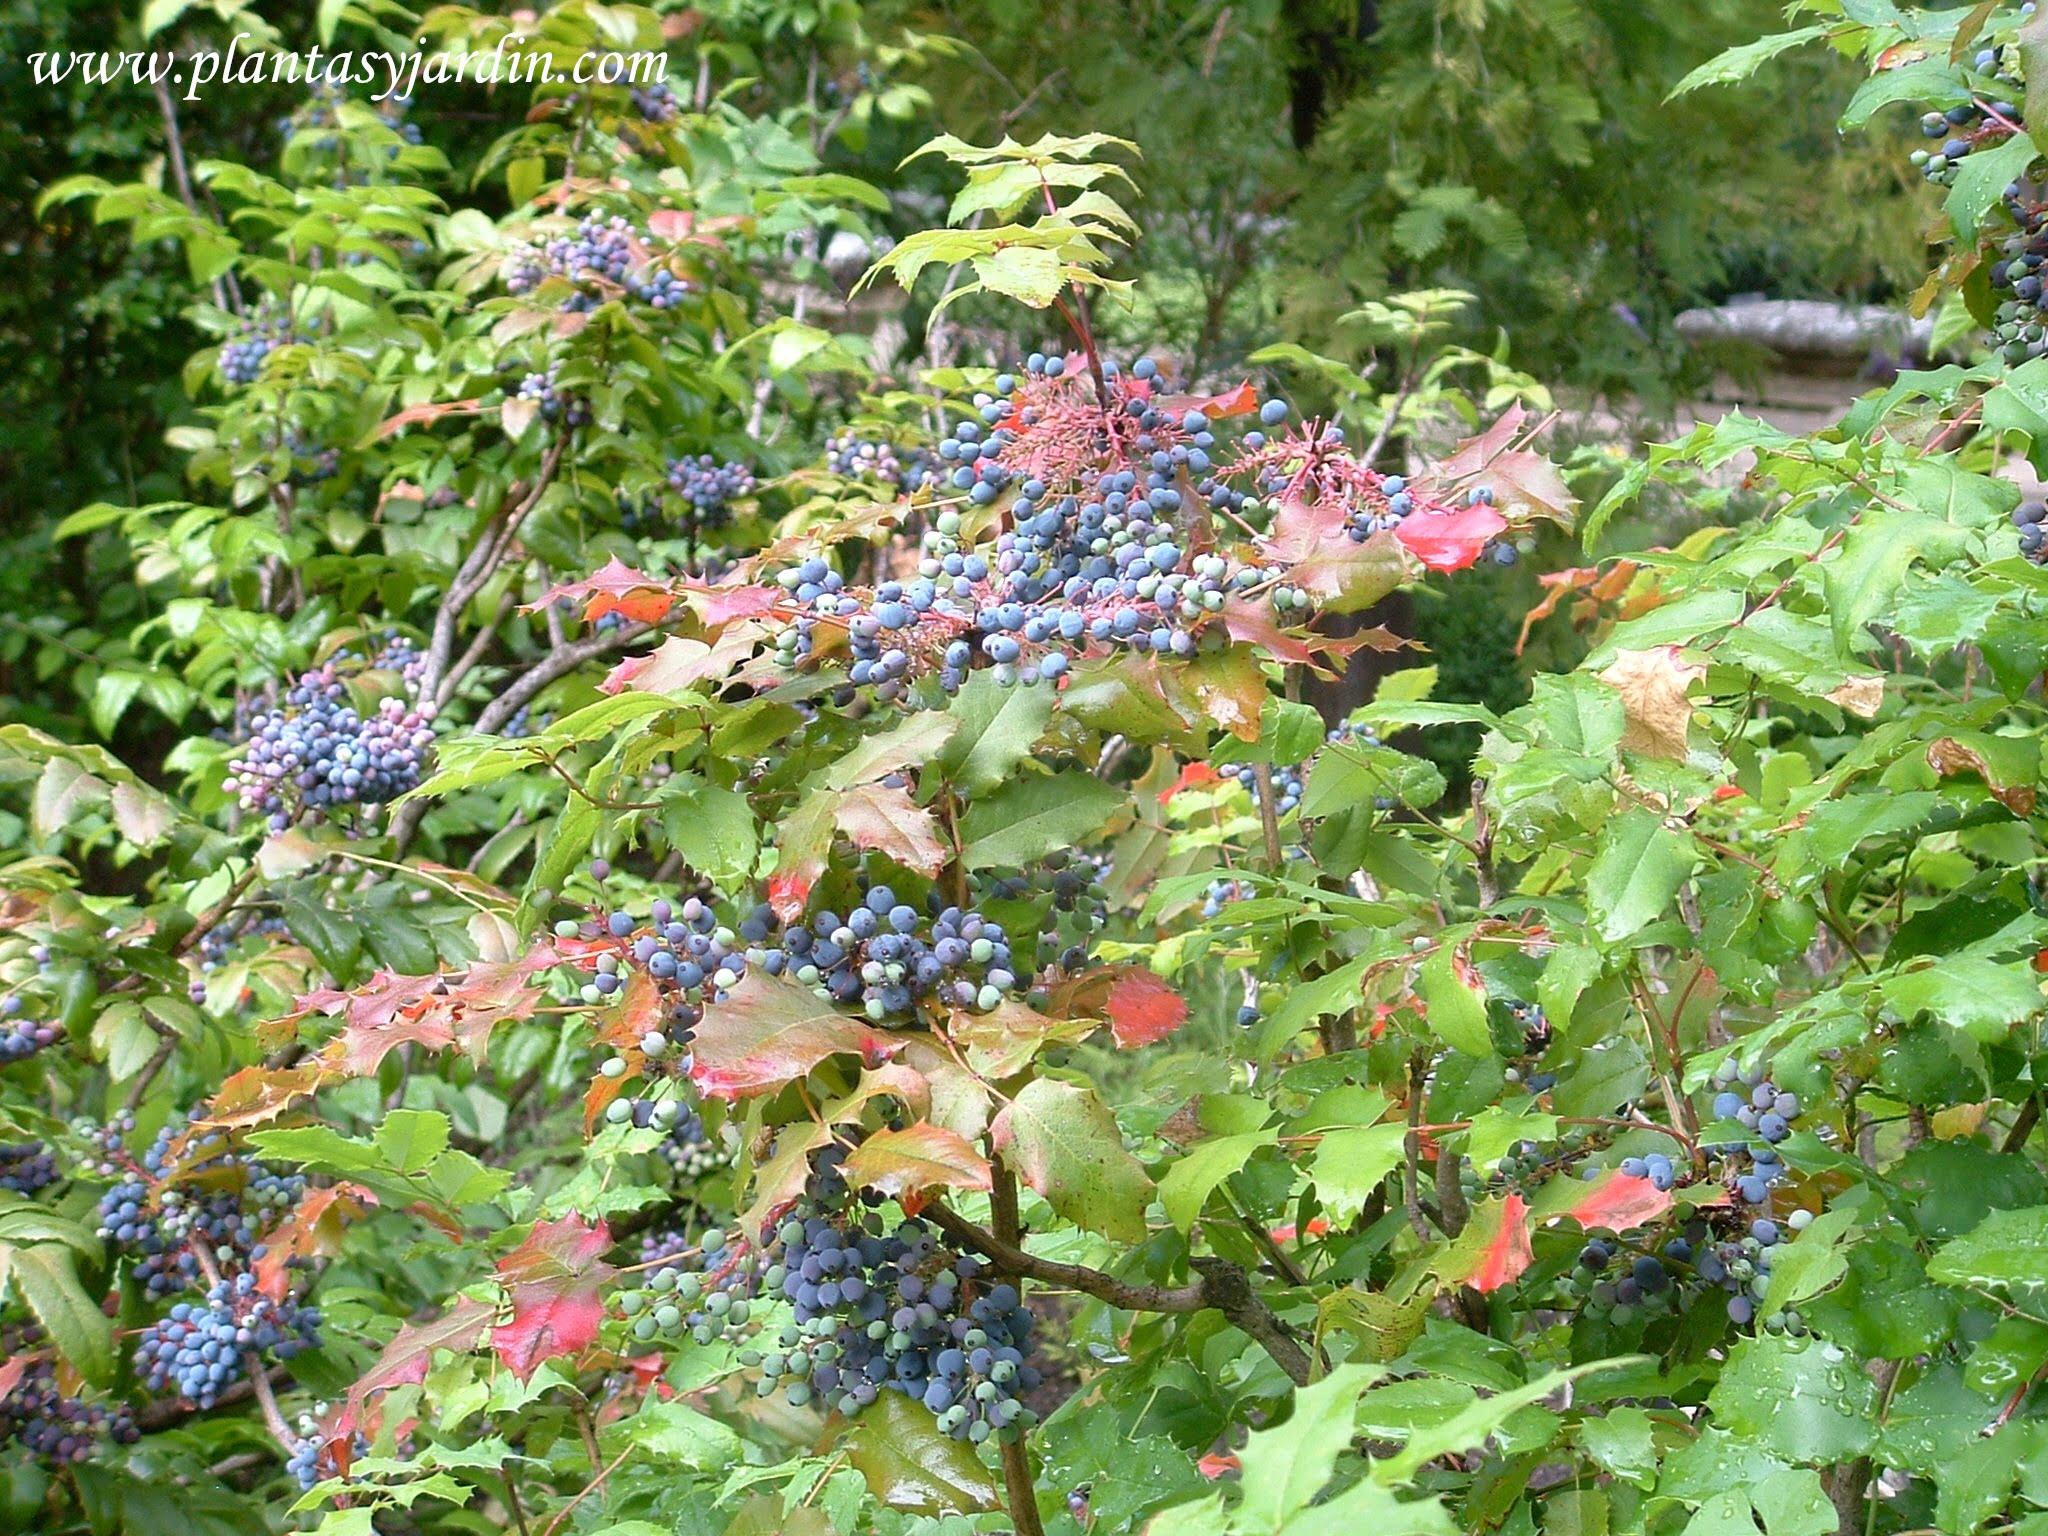 Mahonia aquifolium detalle de frutos & hojas